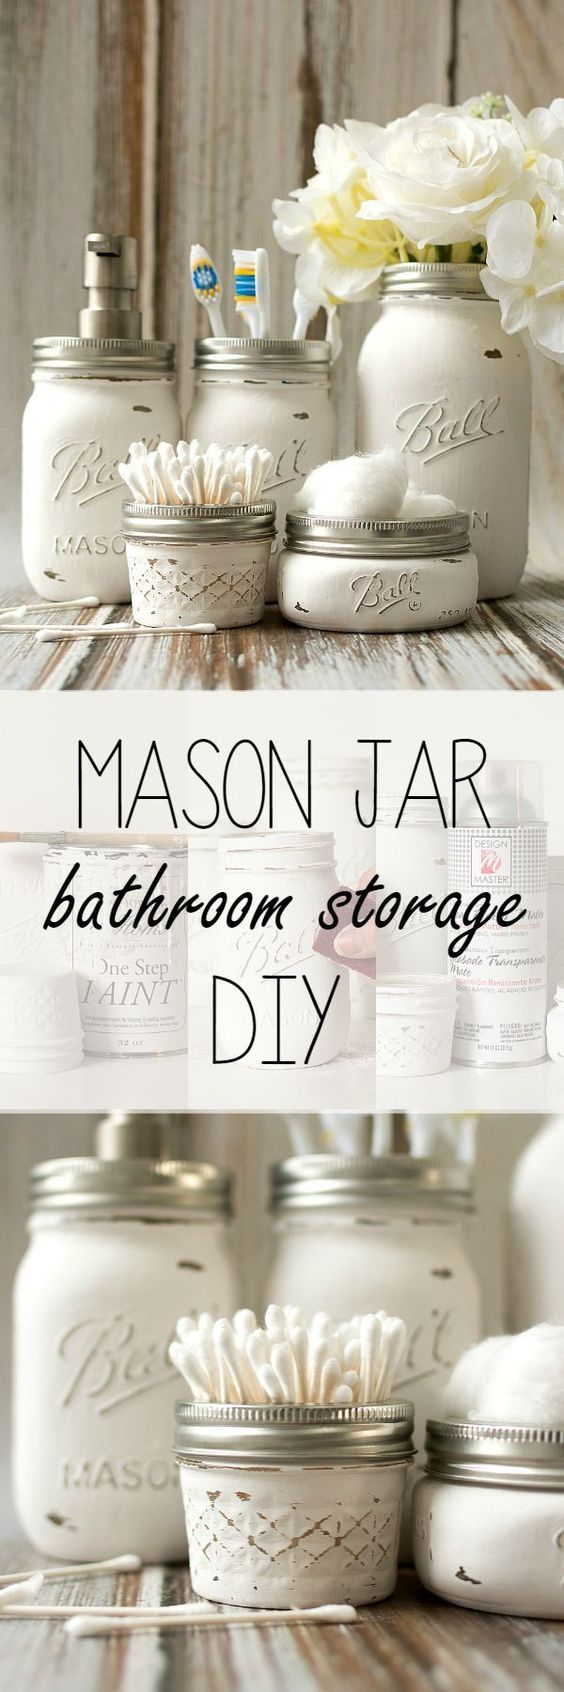 Mason Jar Bathroom Storage & Accessories.